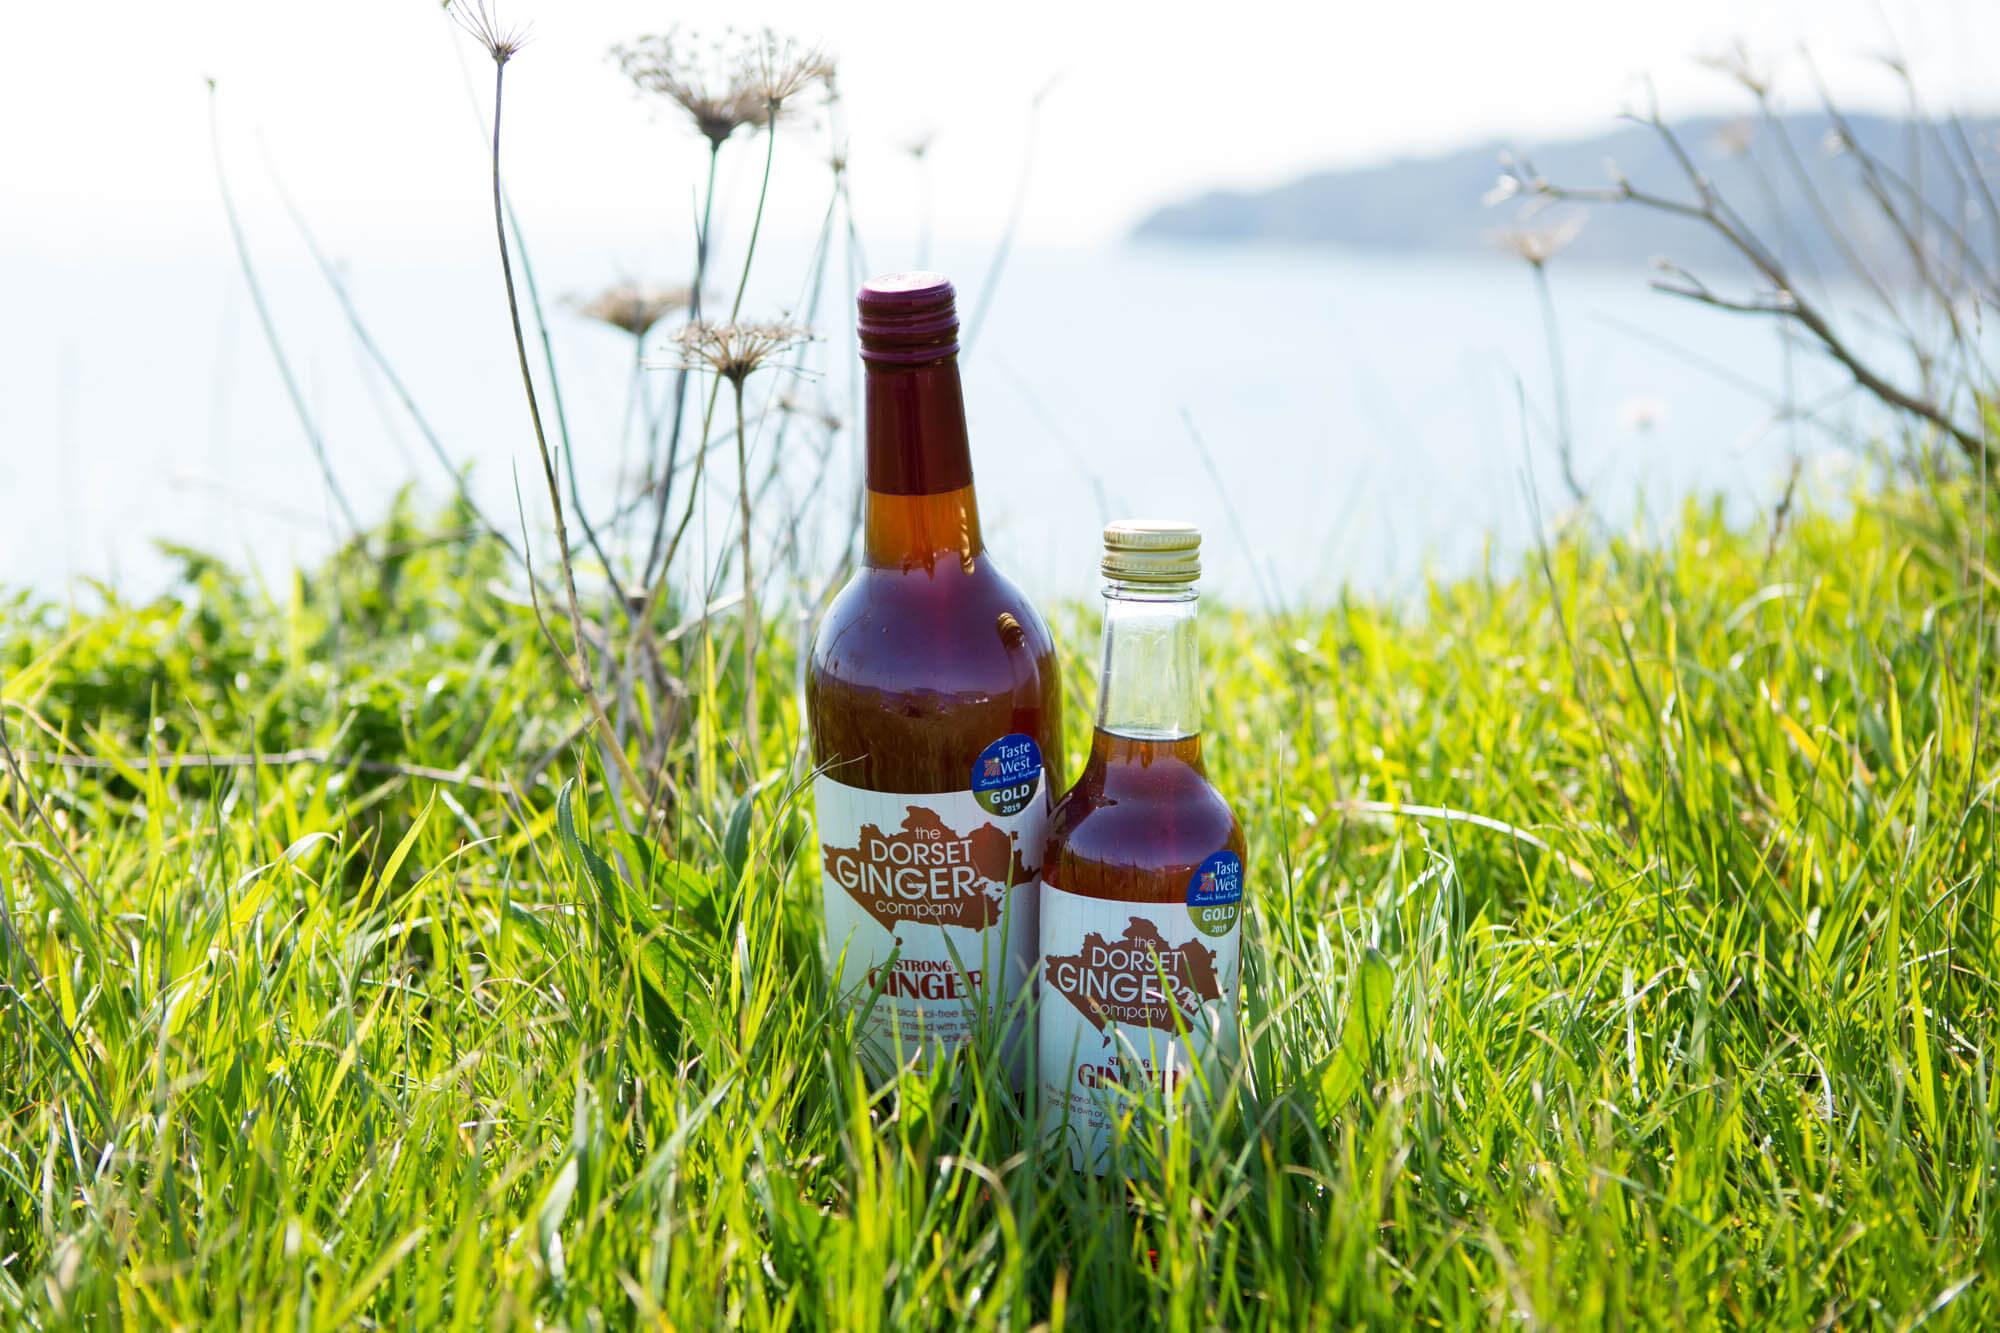 Dorset Ginger bottle- Food _ drink photographer